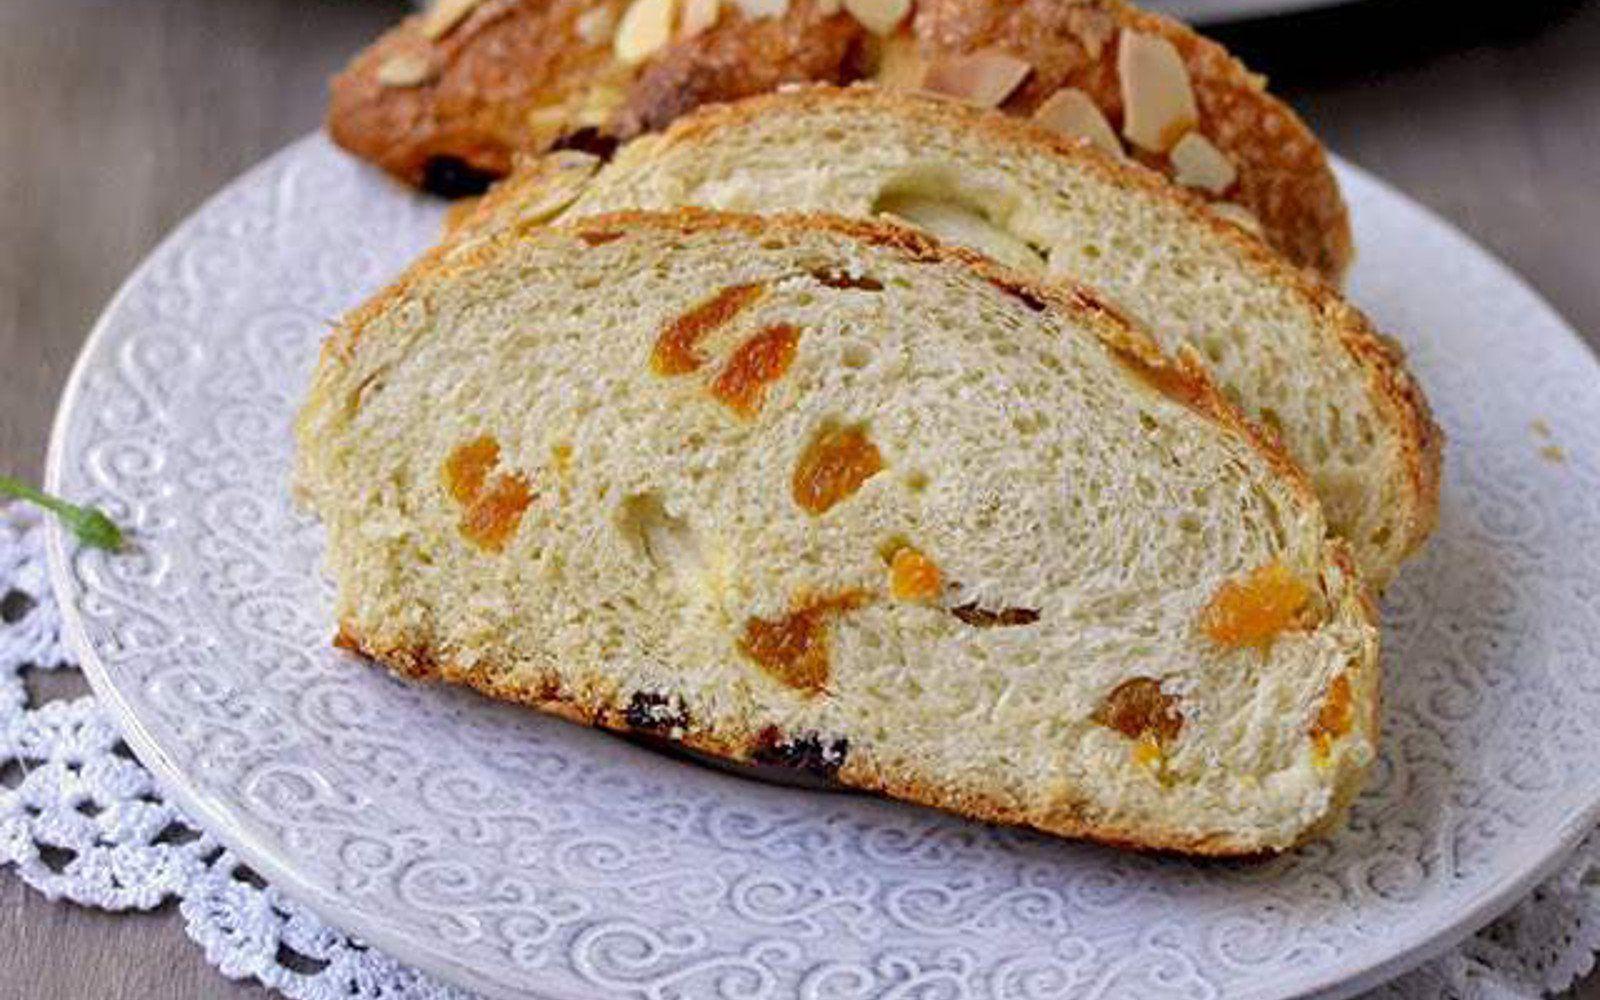 Colomba di pasqua italian easter sweet bread vegan in